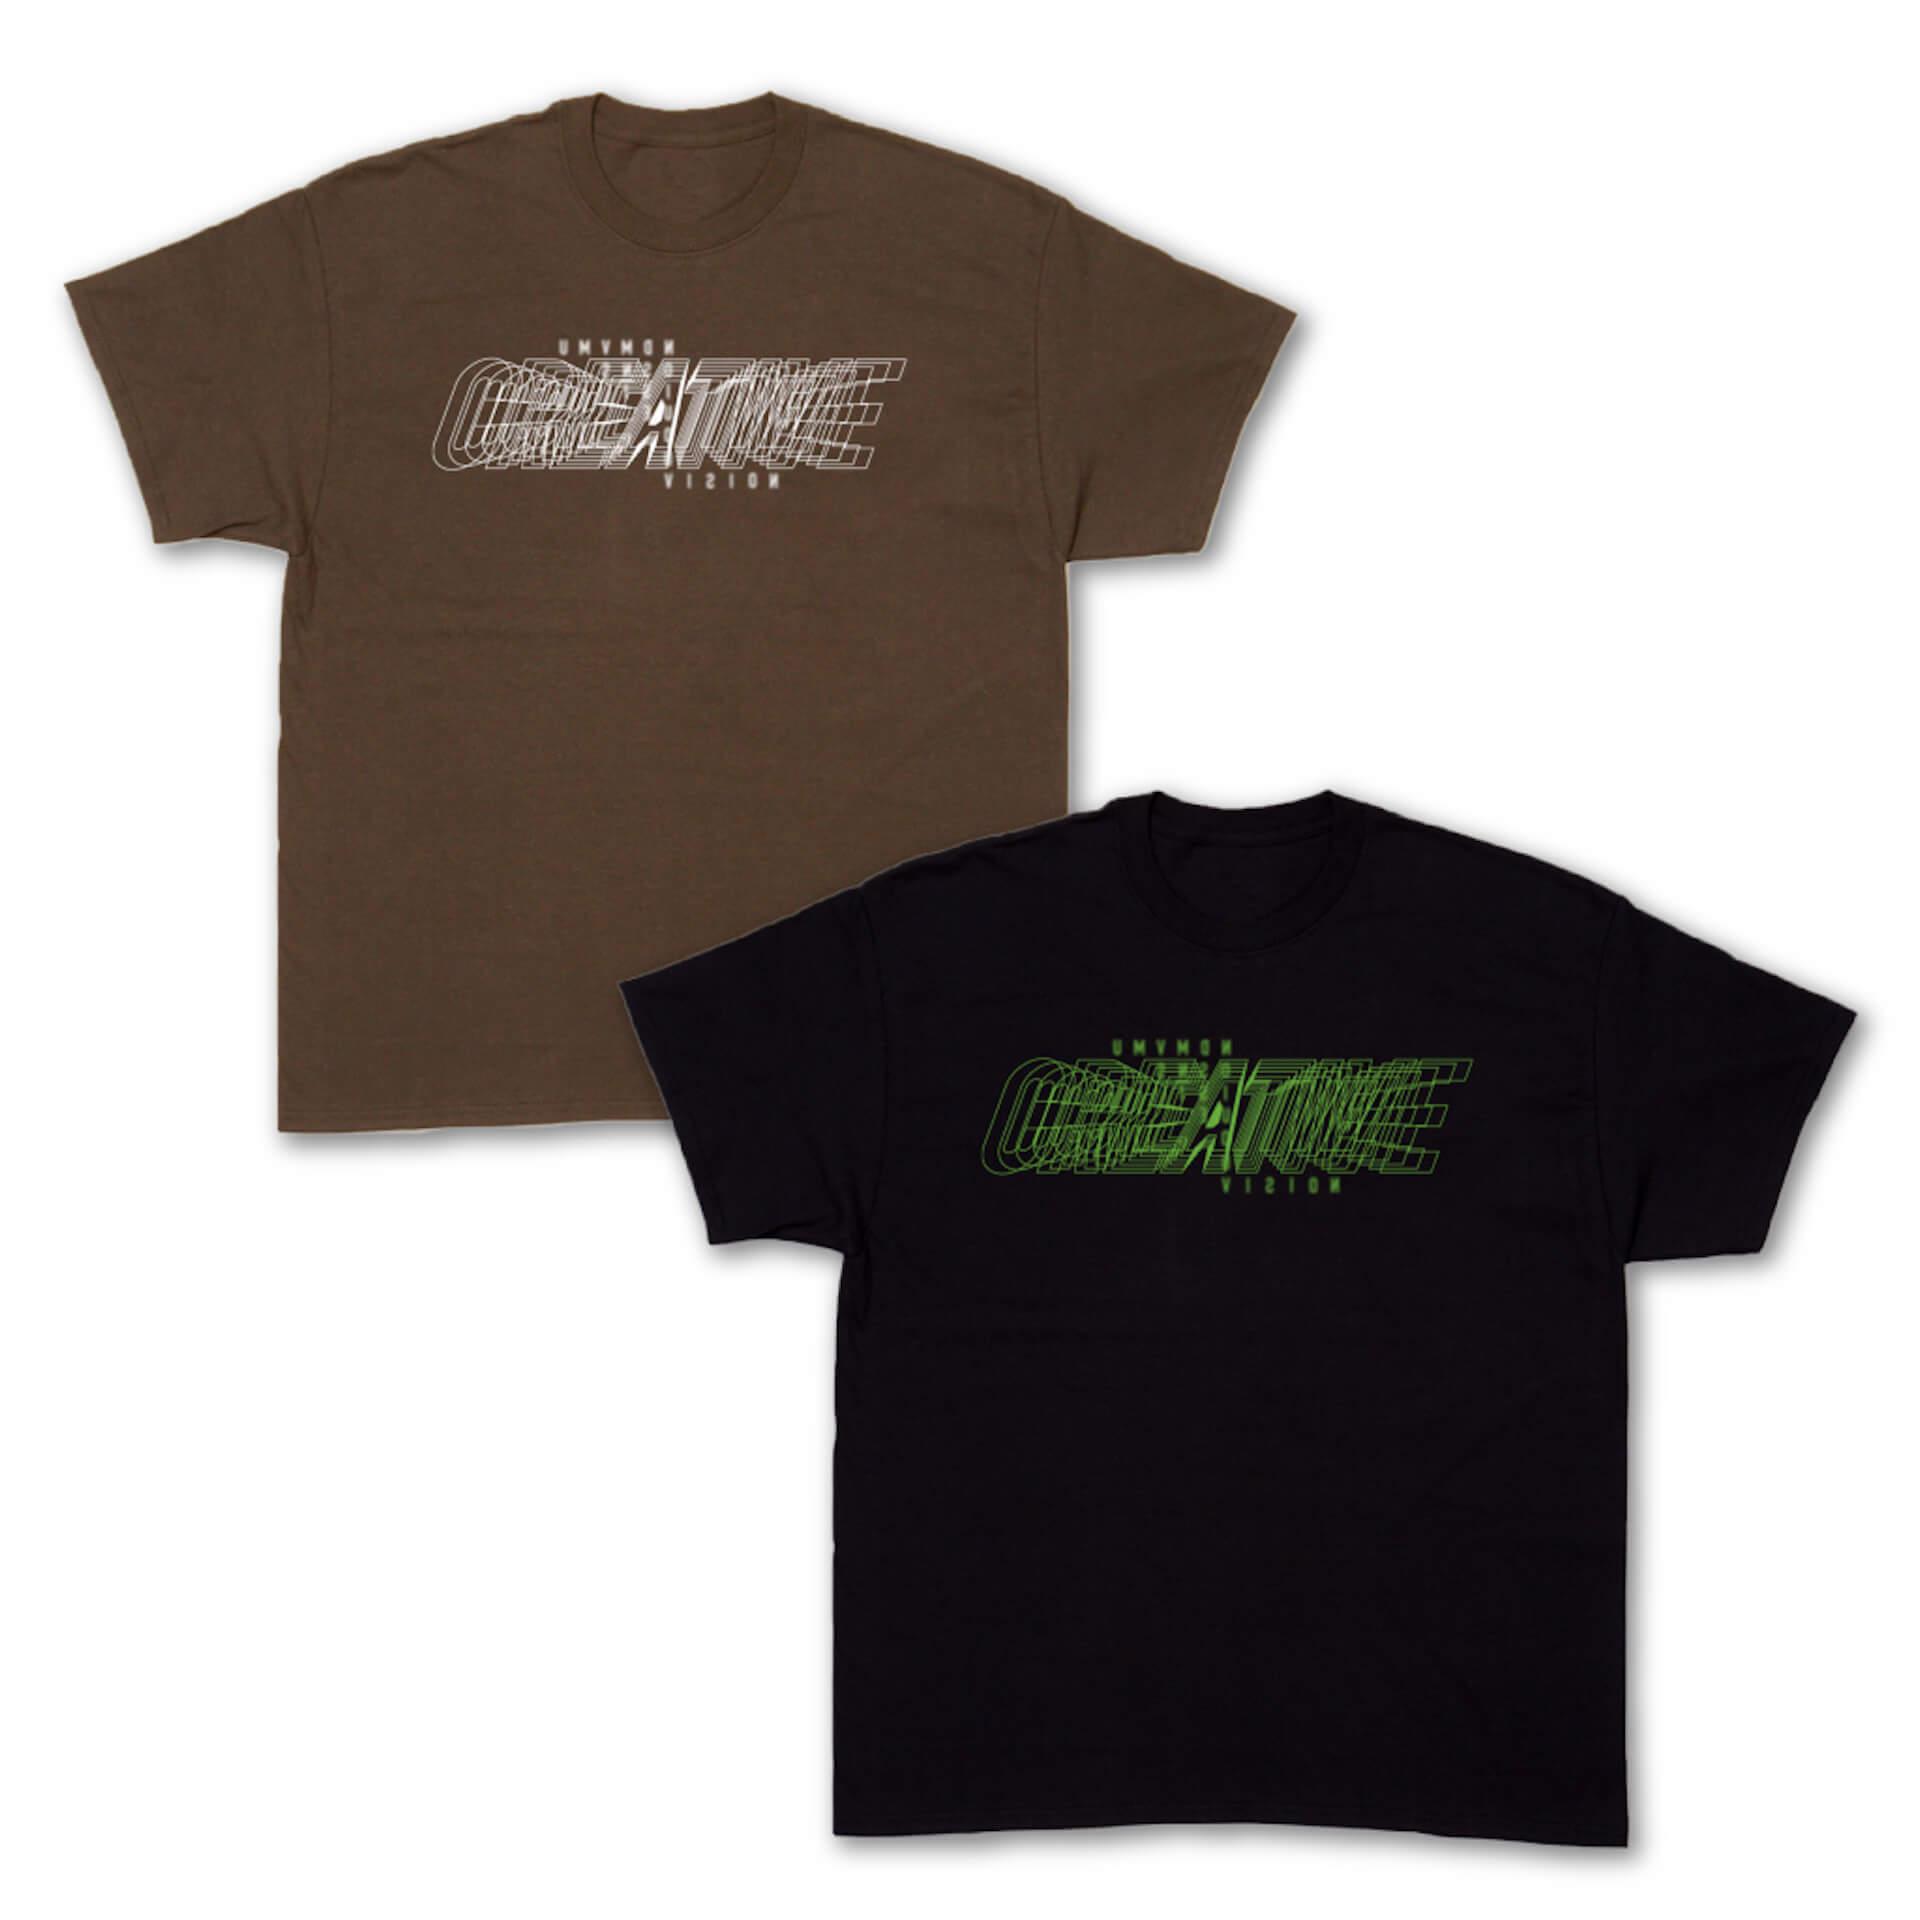 Contact Tokyo&SOUND MUSEUM VISIONのオリジナルデザインTシャツが発売決定!野村訓市、UNDERCOVER、VERDY、YAGIが参加 life210713_contact_vision_5